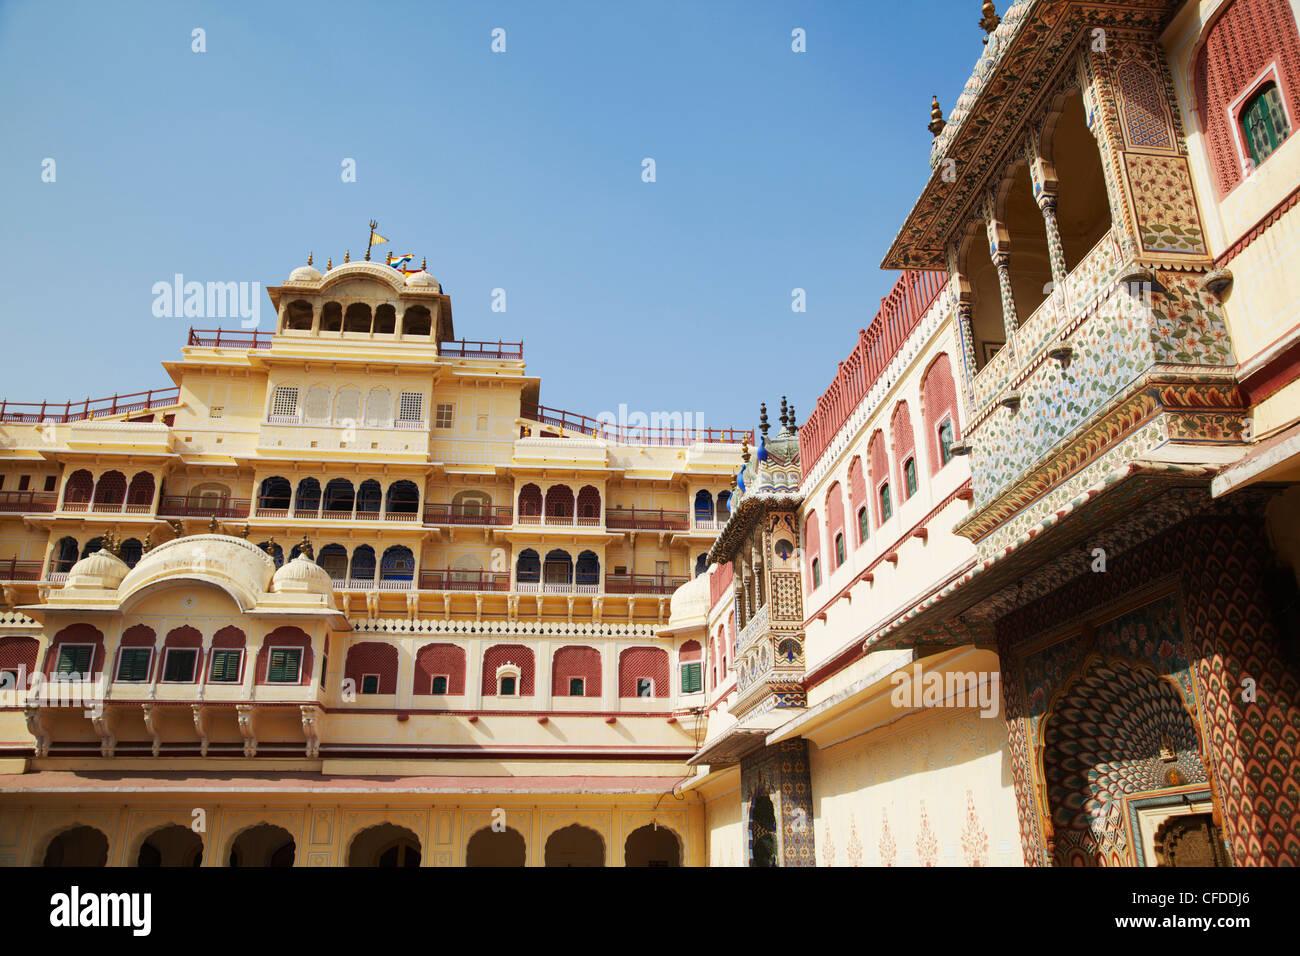 Chandra Mahal, City Palace, Jaipur, Rajasthan, India, Asia Stock Photo